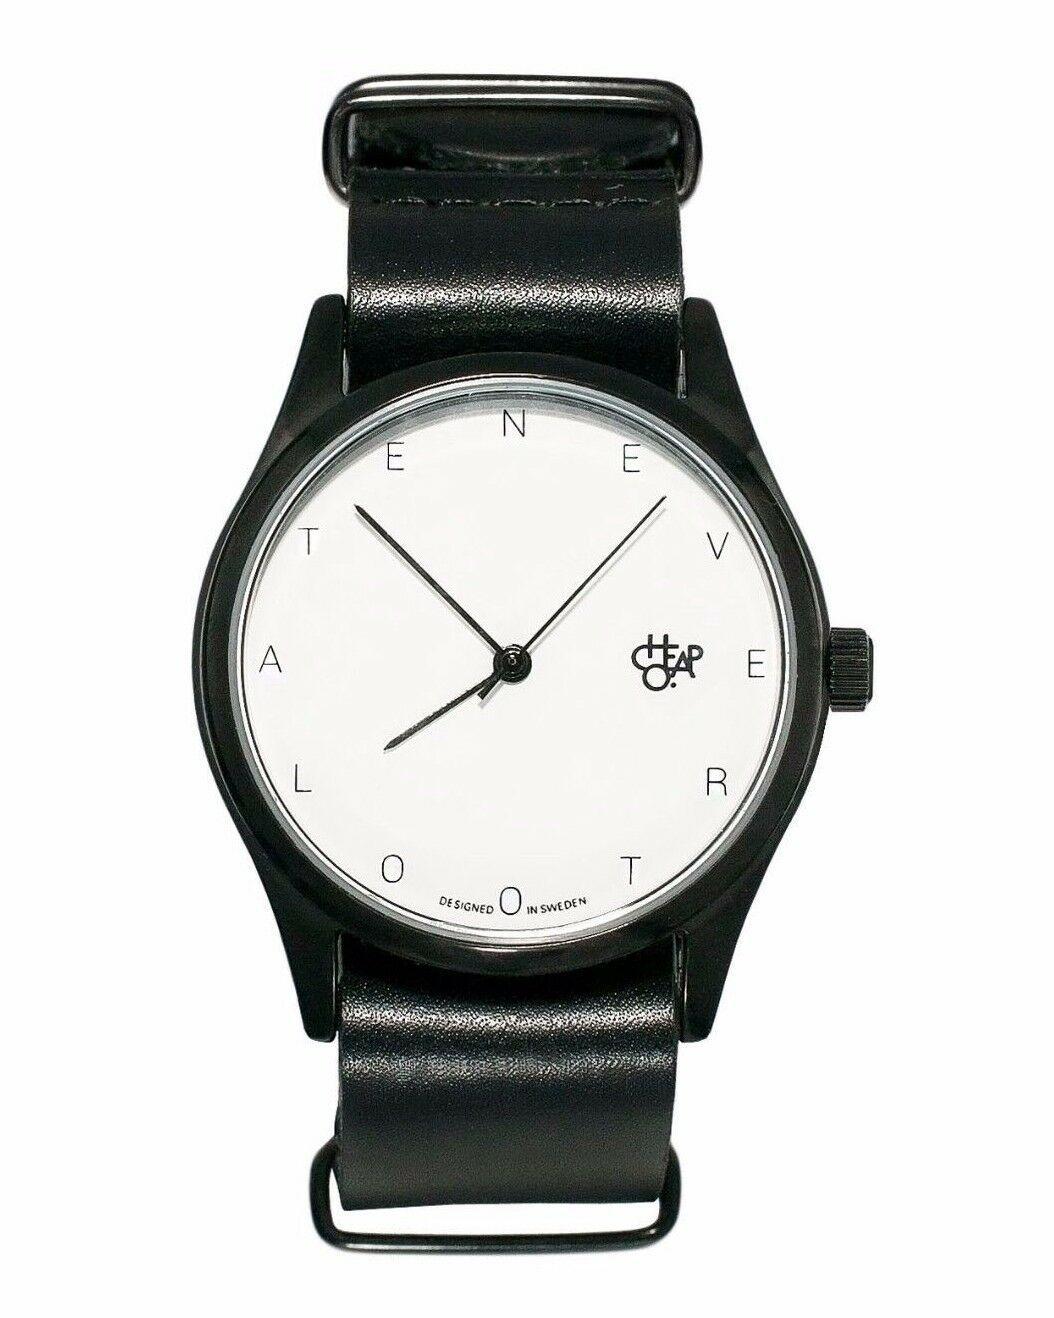 Cheapo CHPO cheapo Never Too Late Black Leather Strap 1422700 Analog Wrist Watch